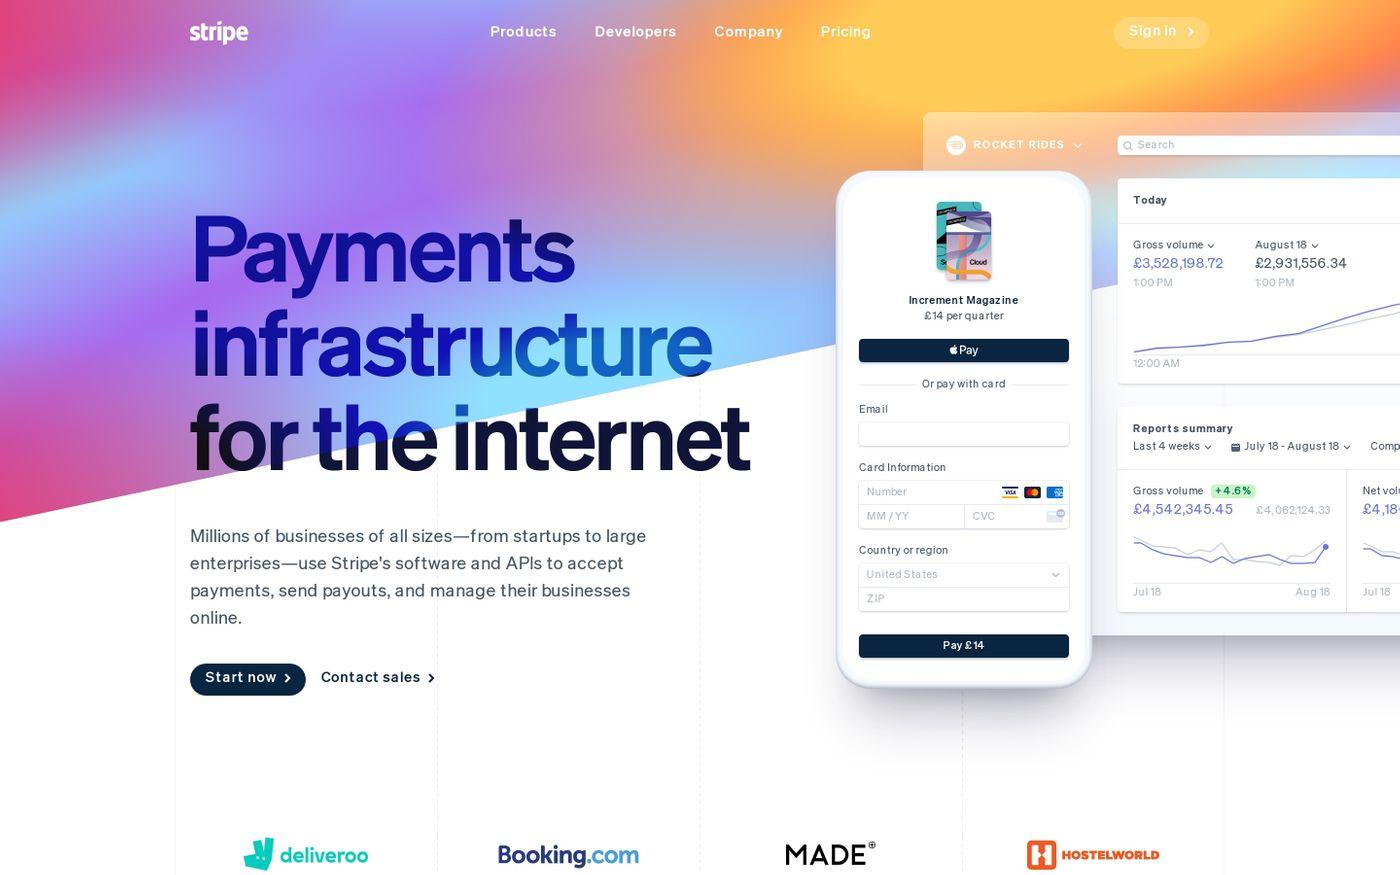 Screenshot of Stripe website